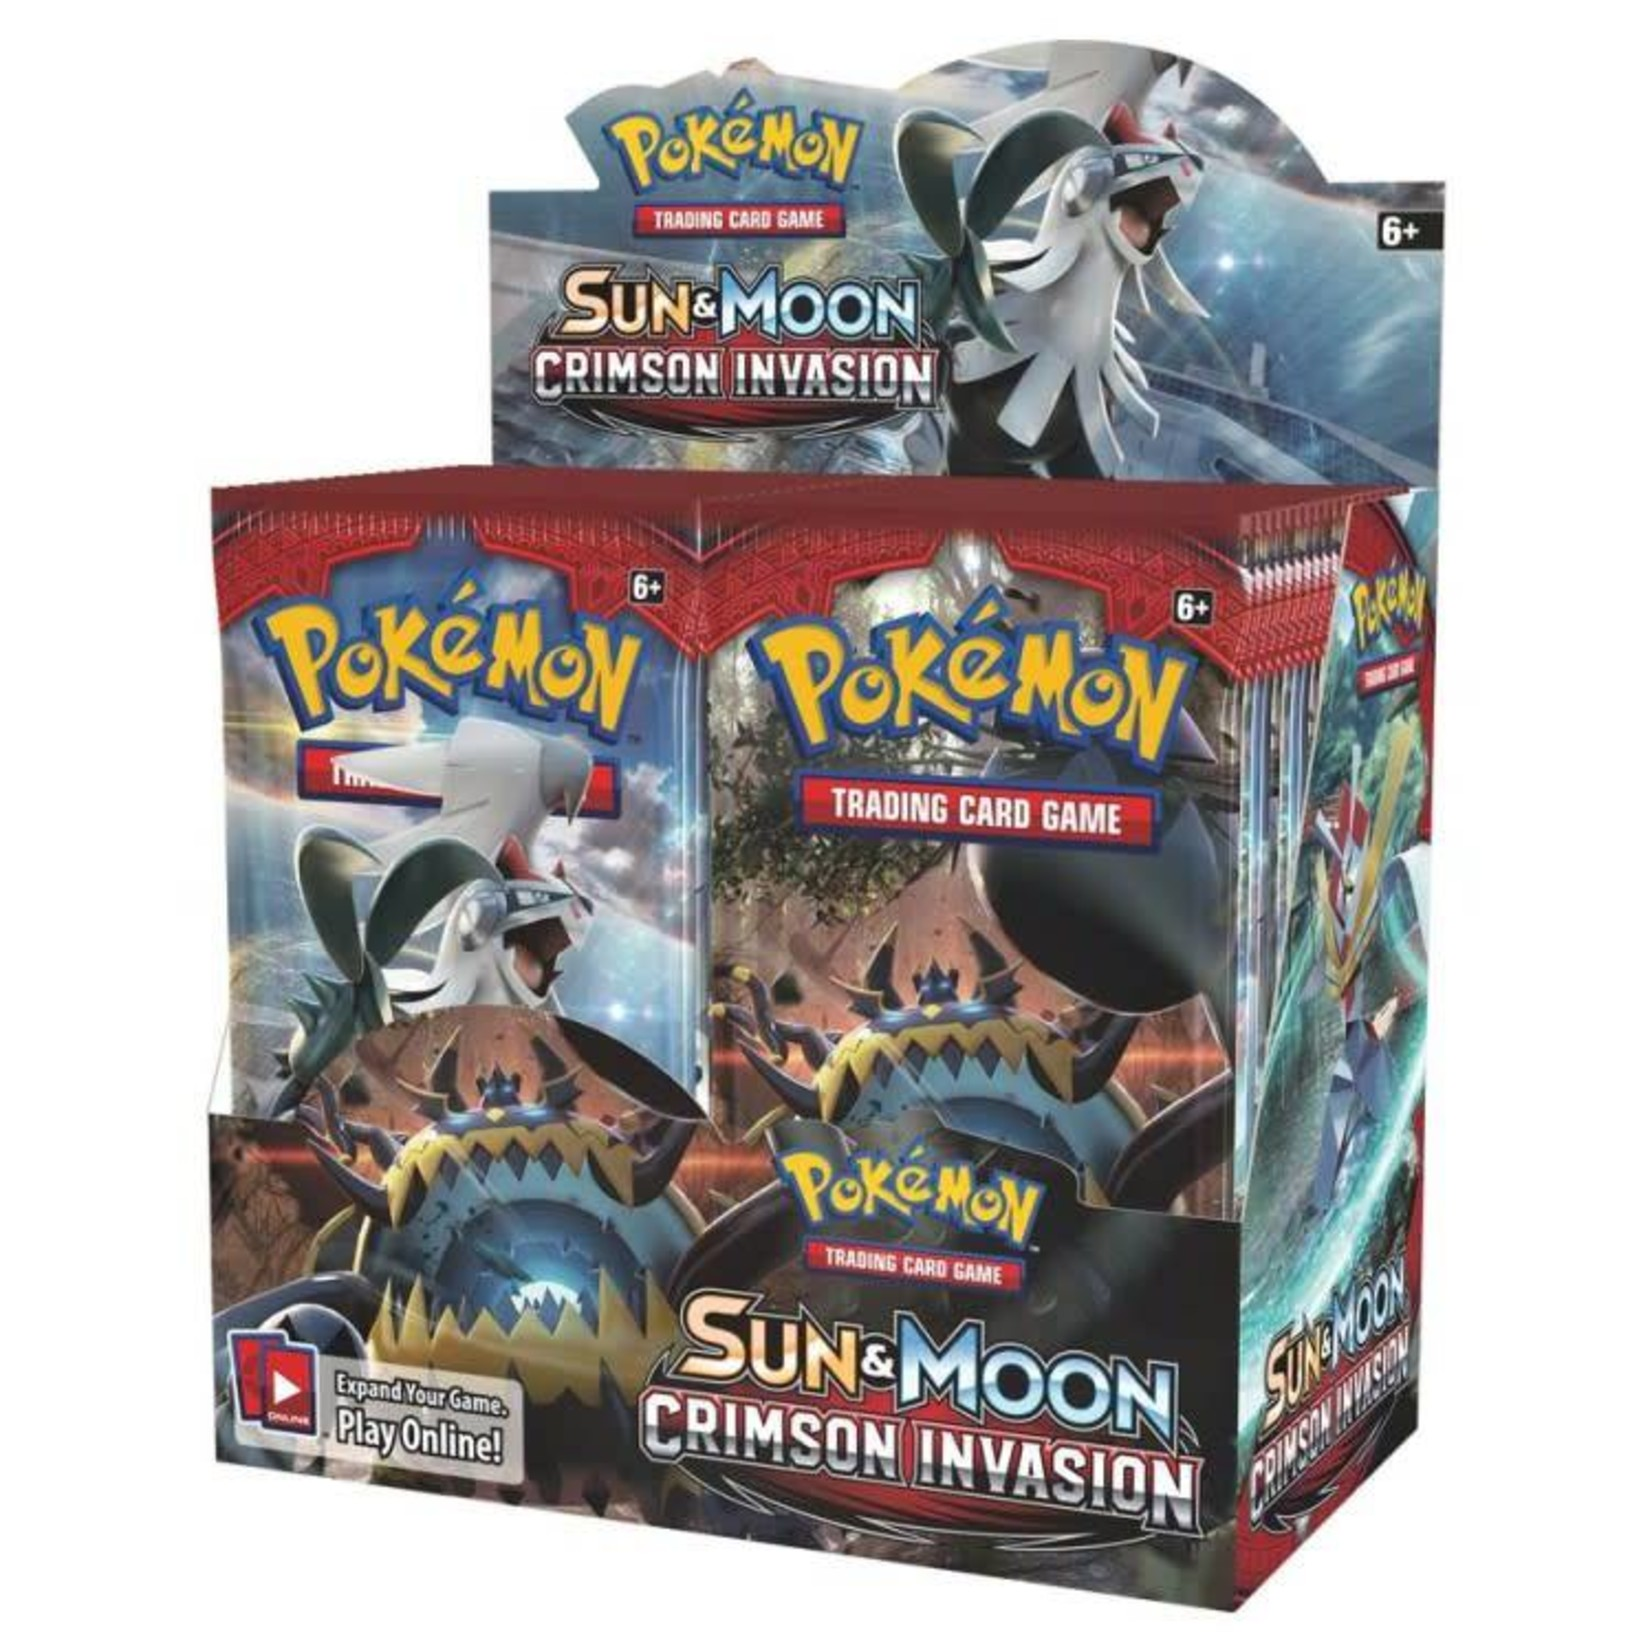 Pokemon International Pokemon Crimson Invasion booster display